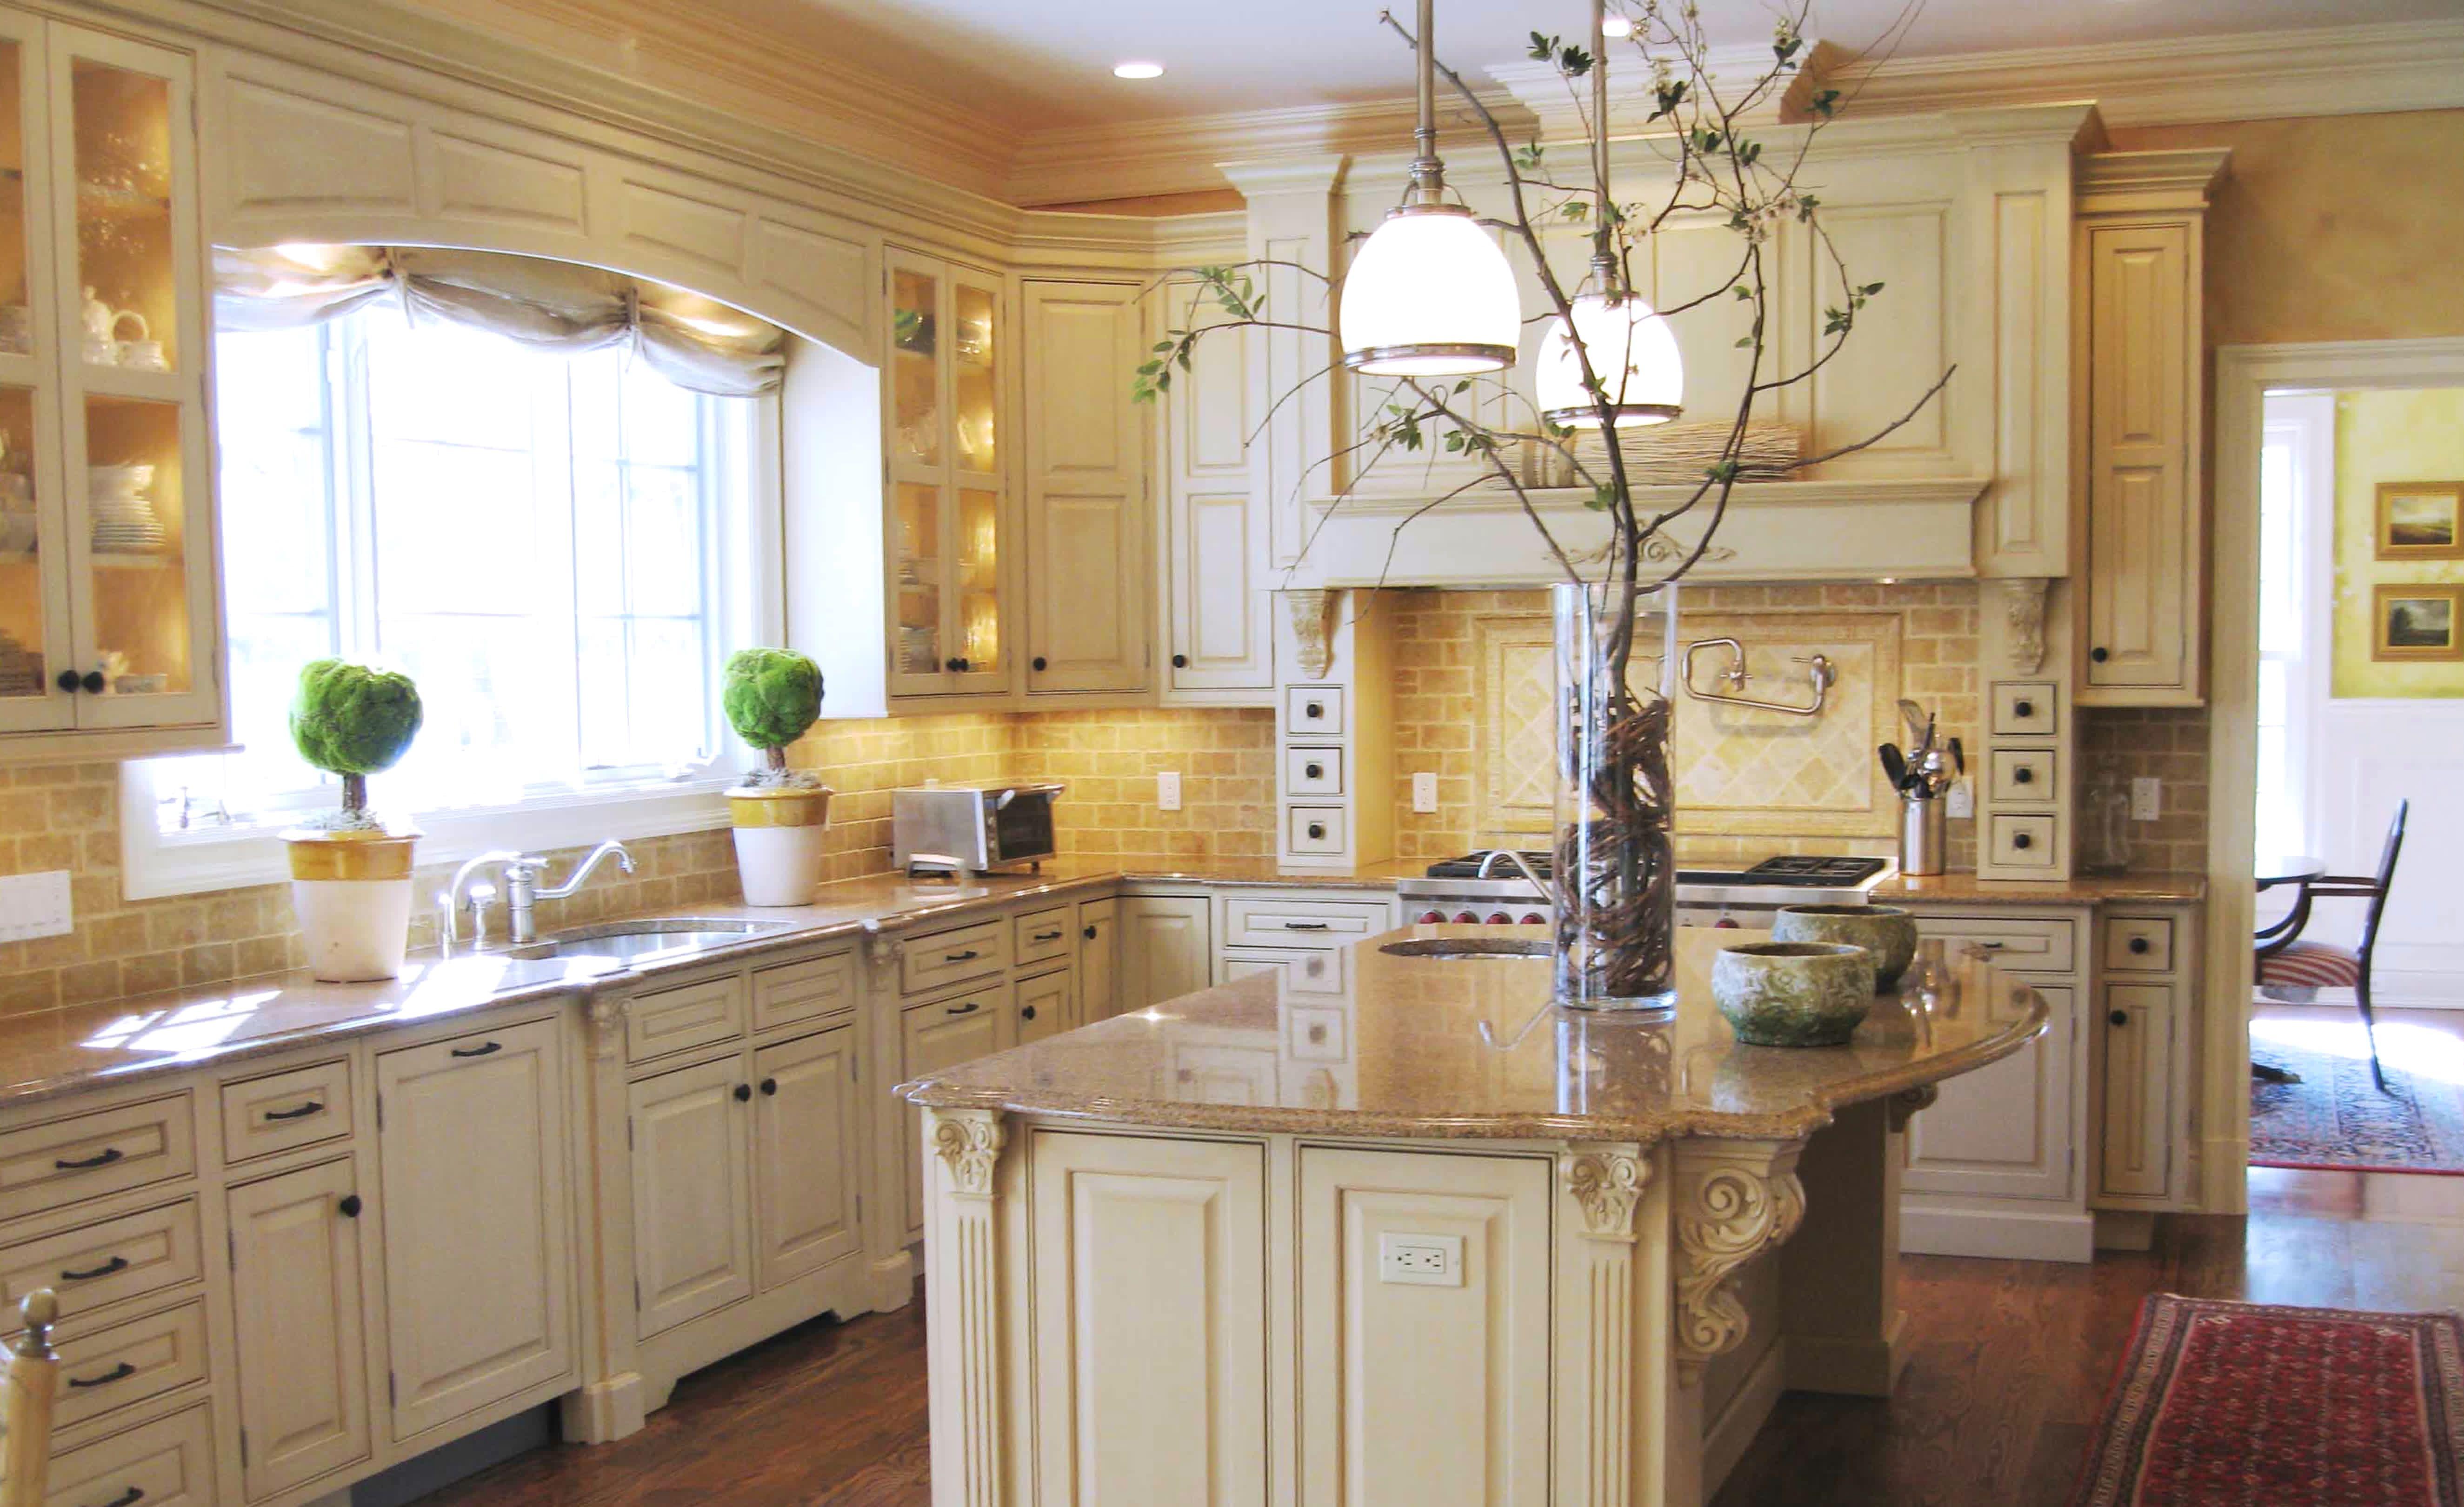 Ideas for kitchen decor  Modern Kitchen Decor Easy Modern Kitchen decor ideas for your